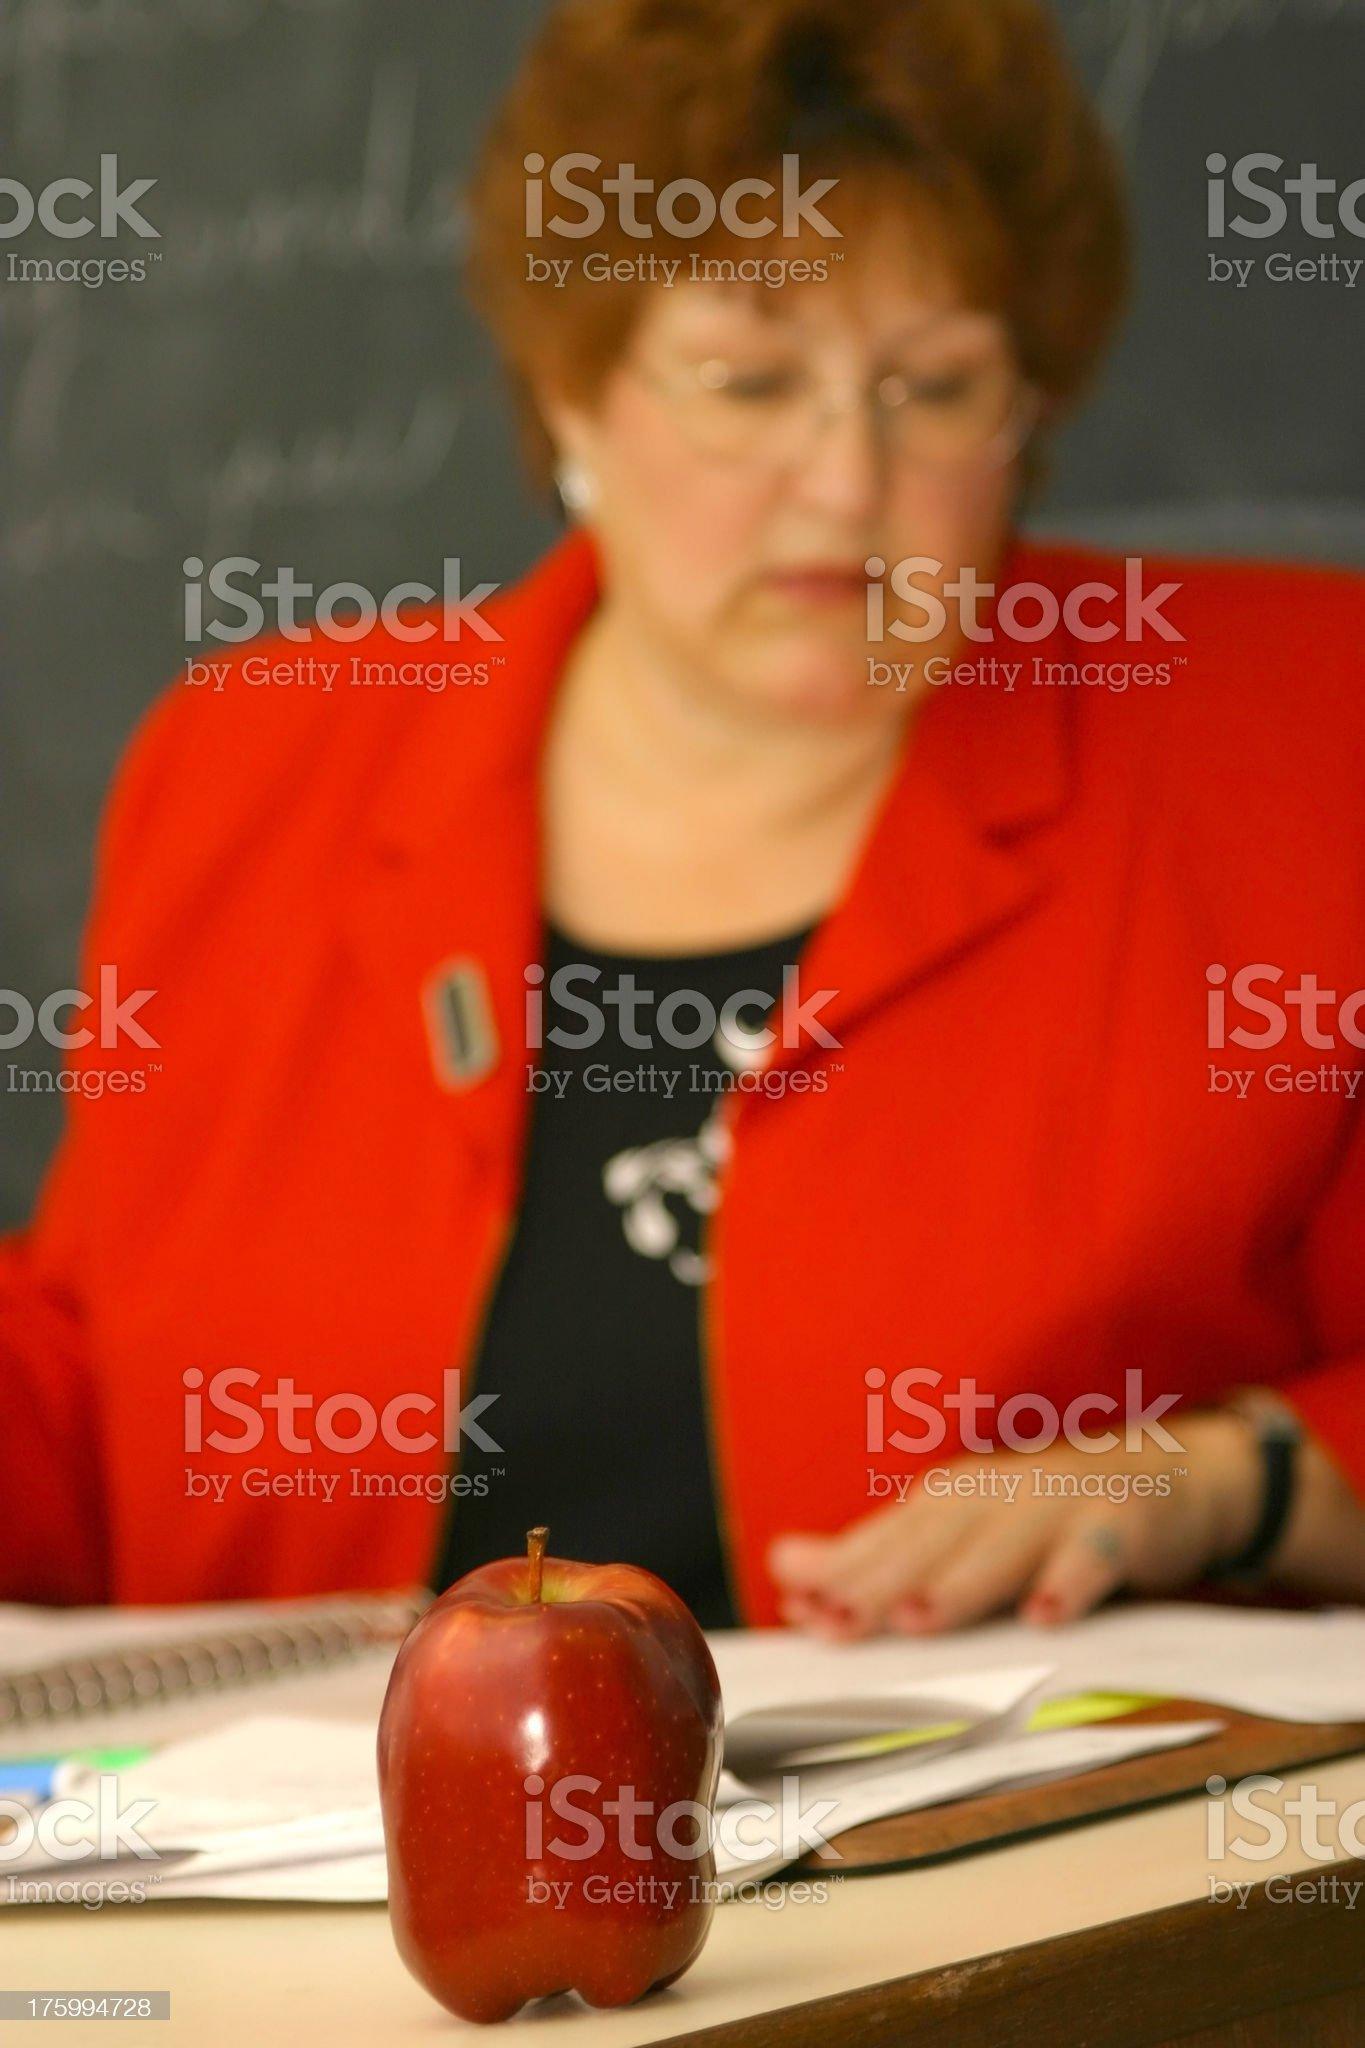 Teacher Series: Busy royalty-free stock photo